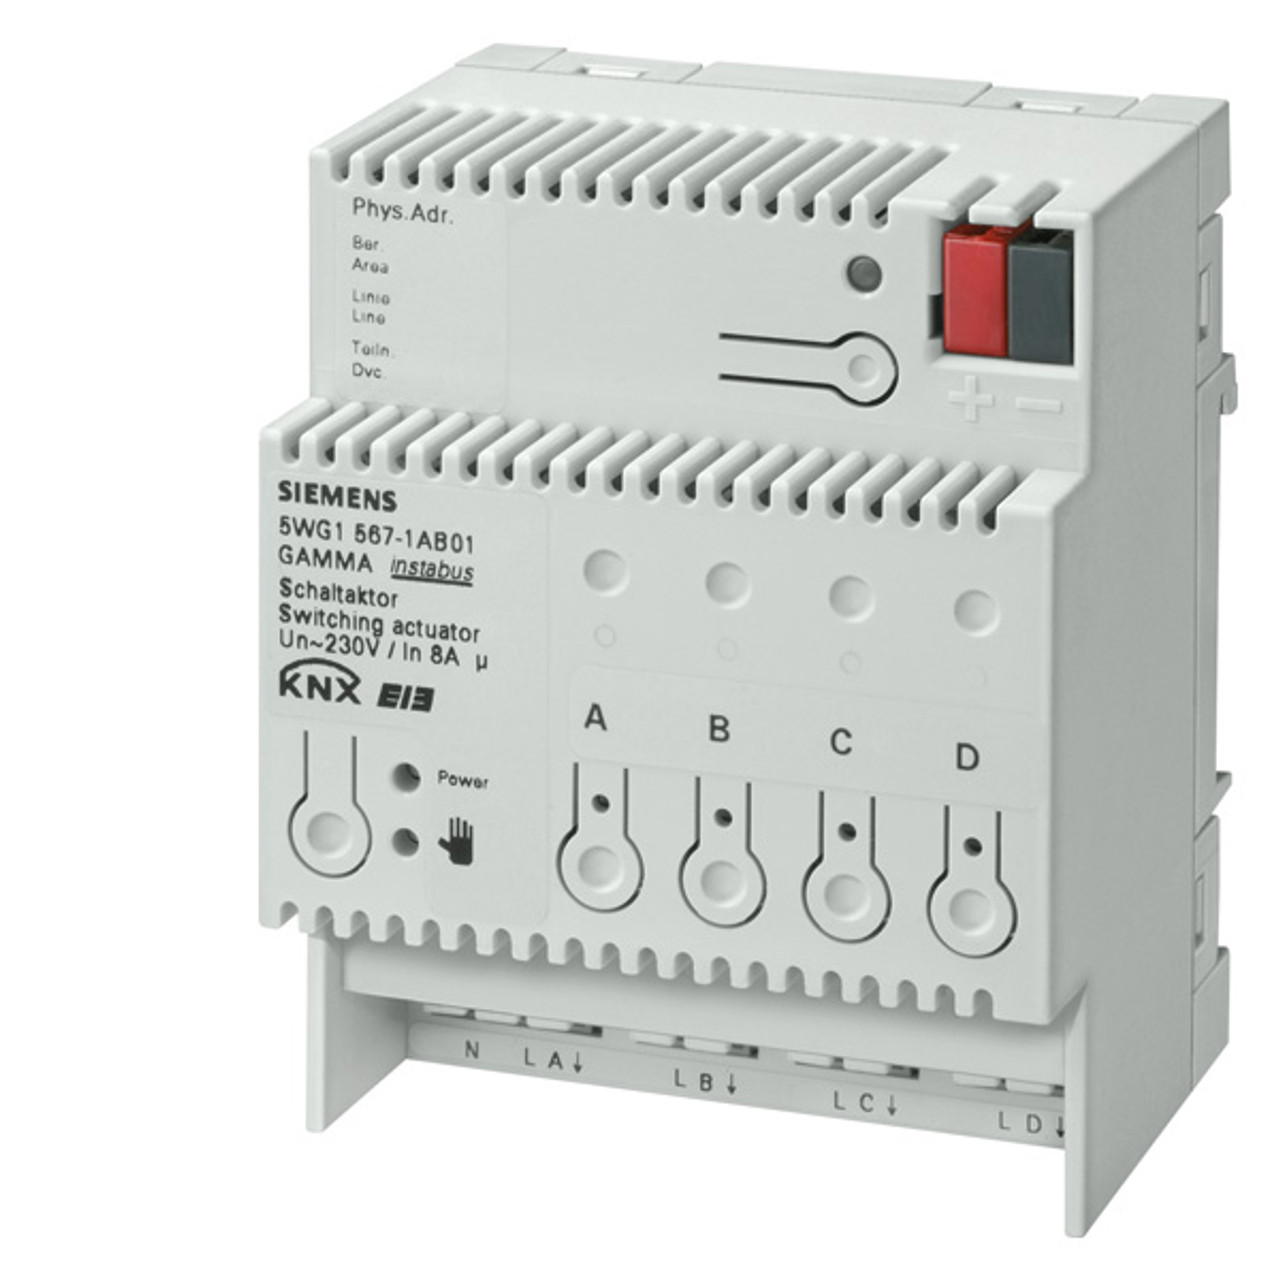 Siemens 5WG1567-1AB01